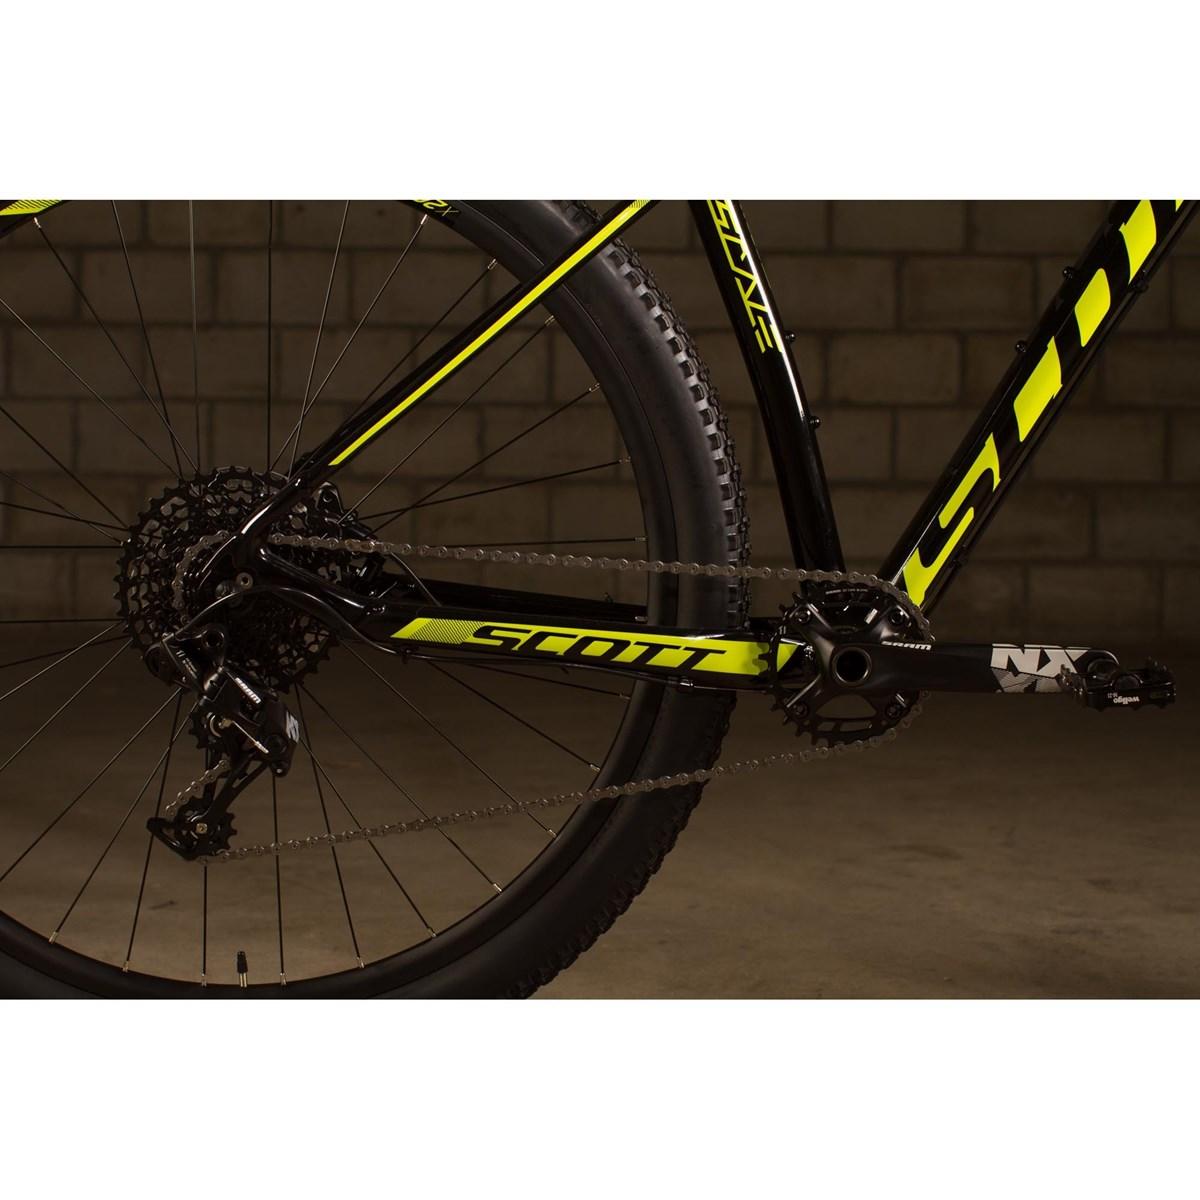 ad849afd300 2018 Scott Scale 980 29ner Hardtail Mountain Bike £979.00